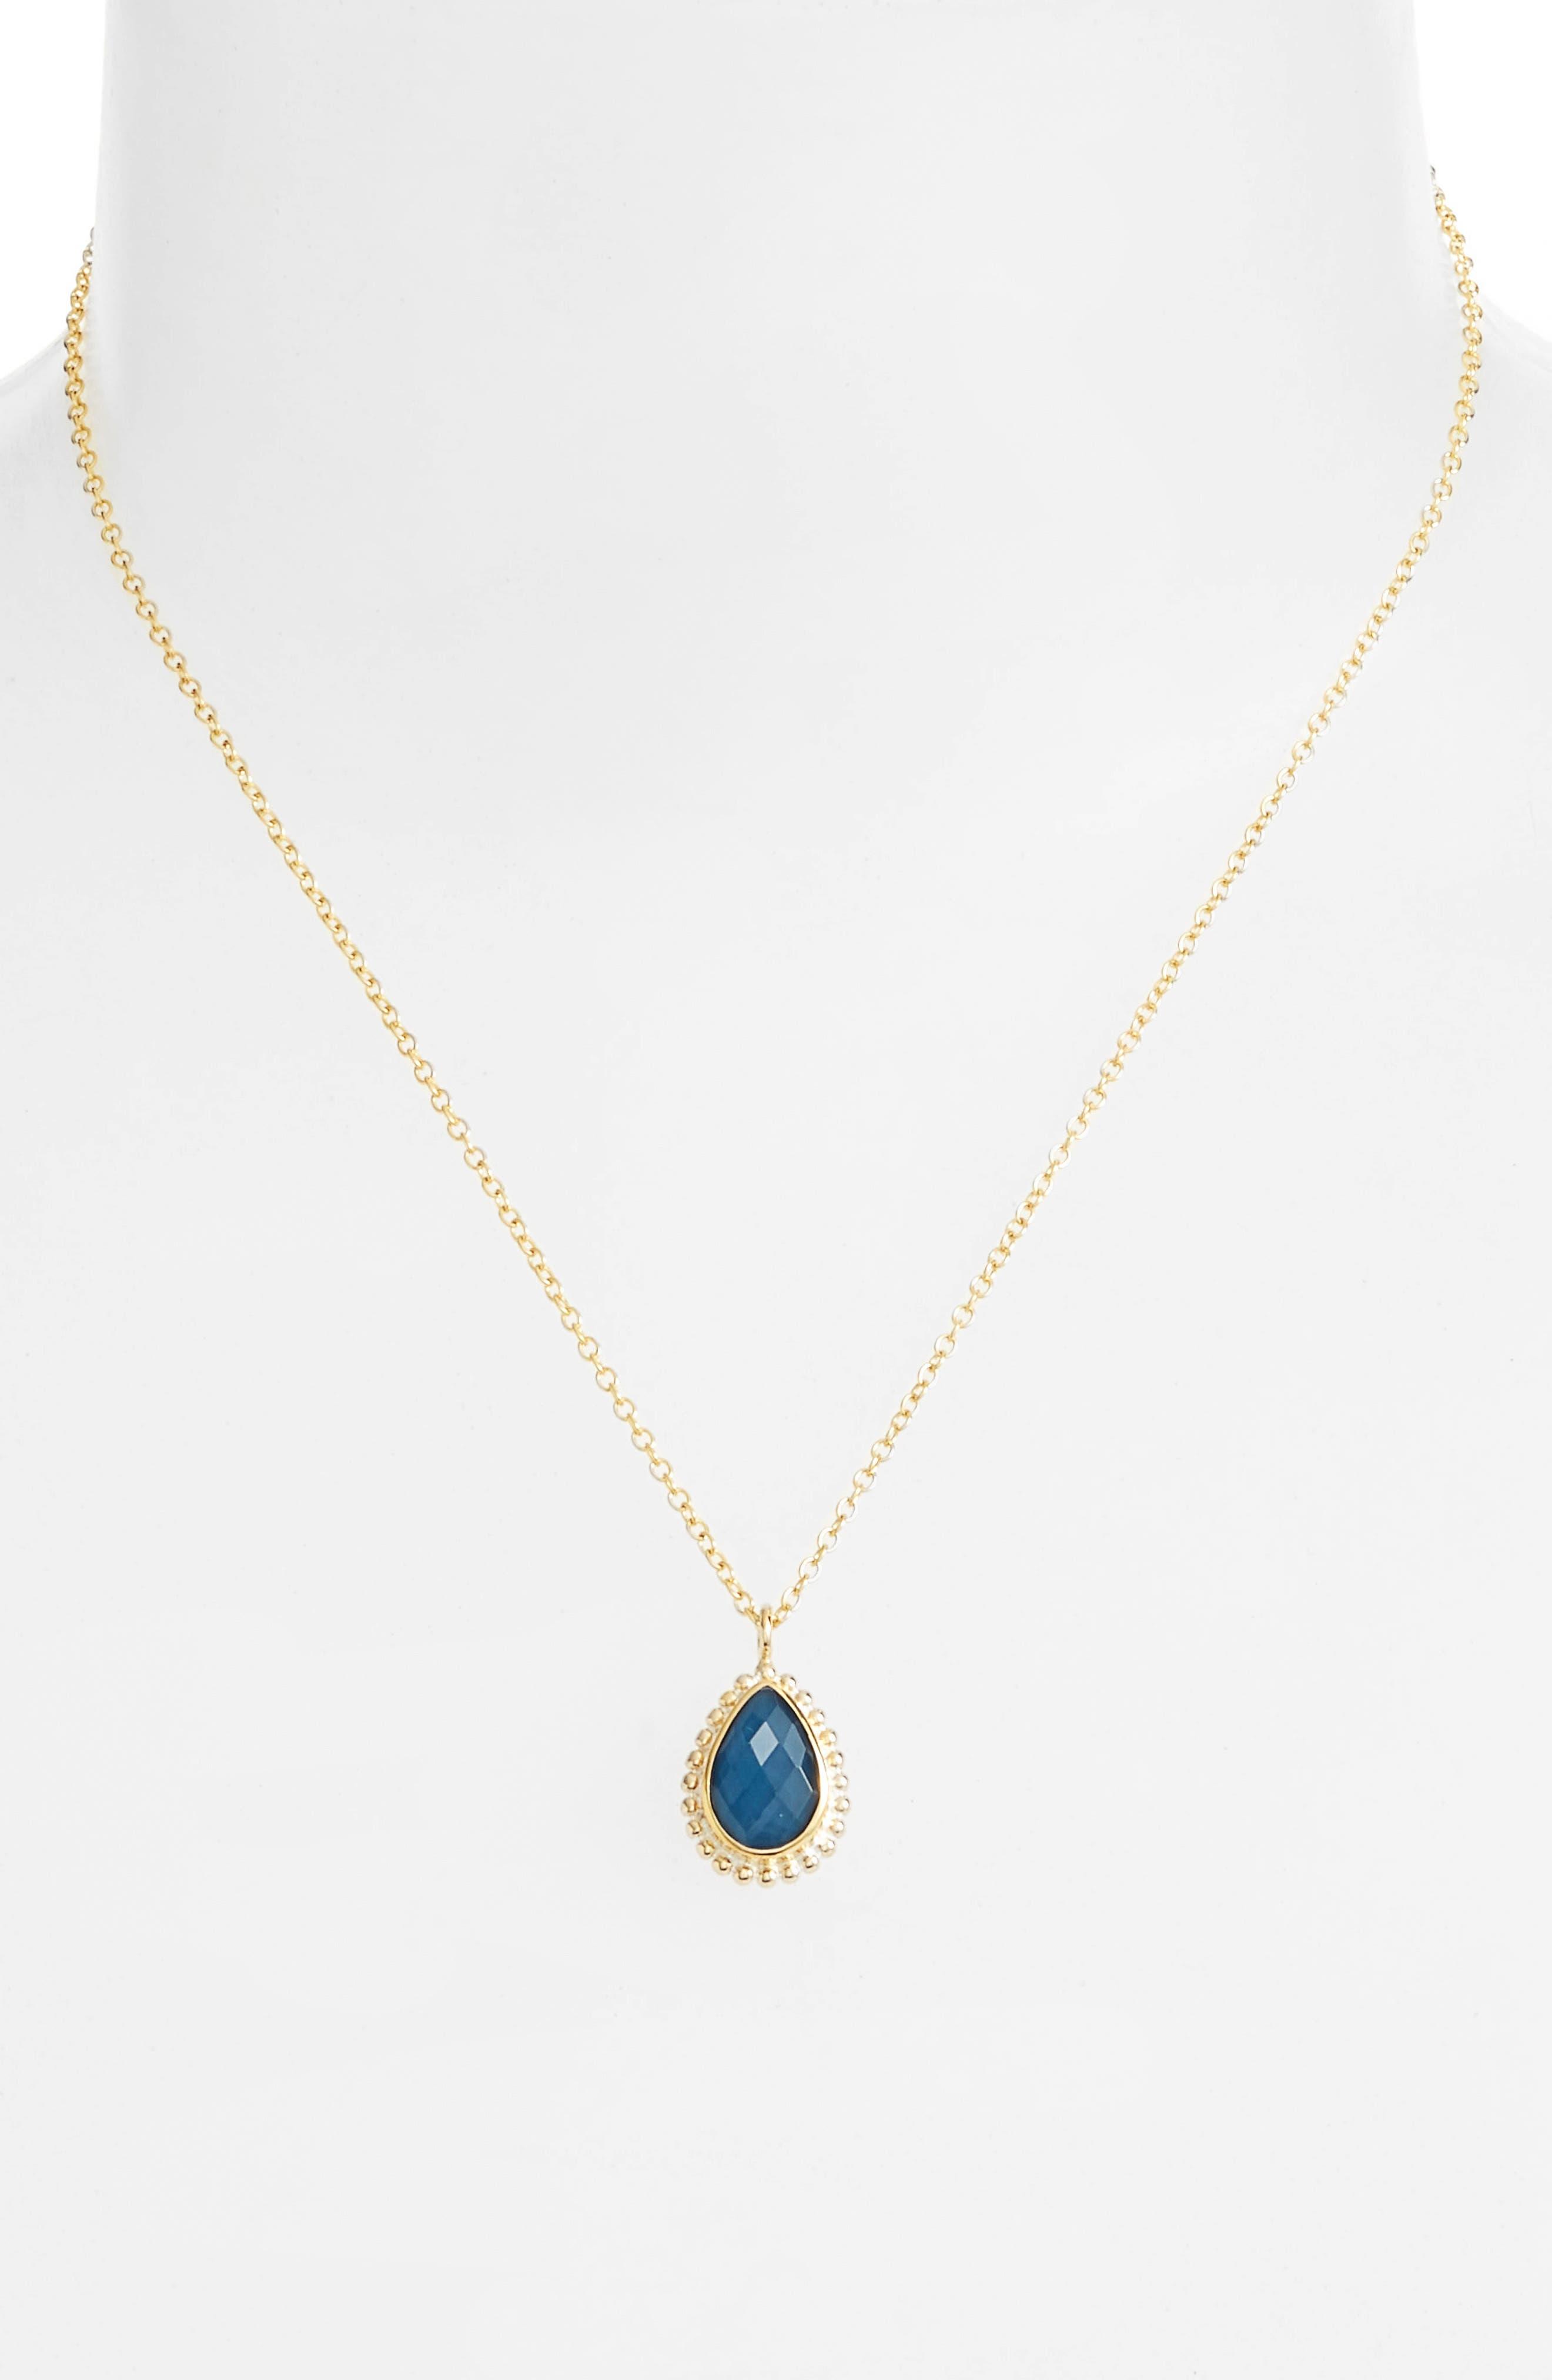 Main Image - Anna Beck Blue Quartz Teardrop Pendant Necklace